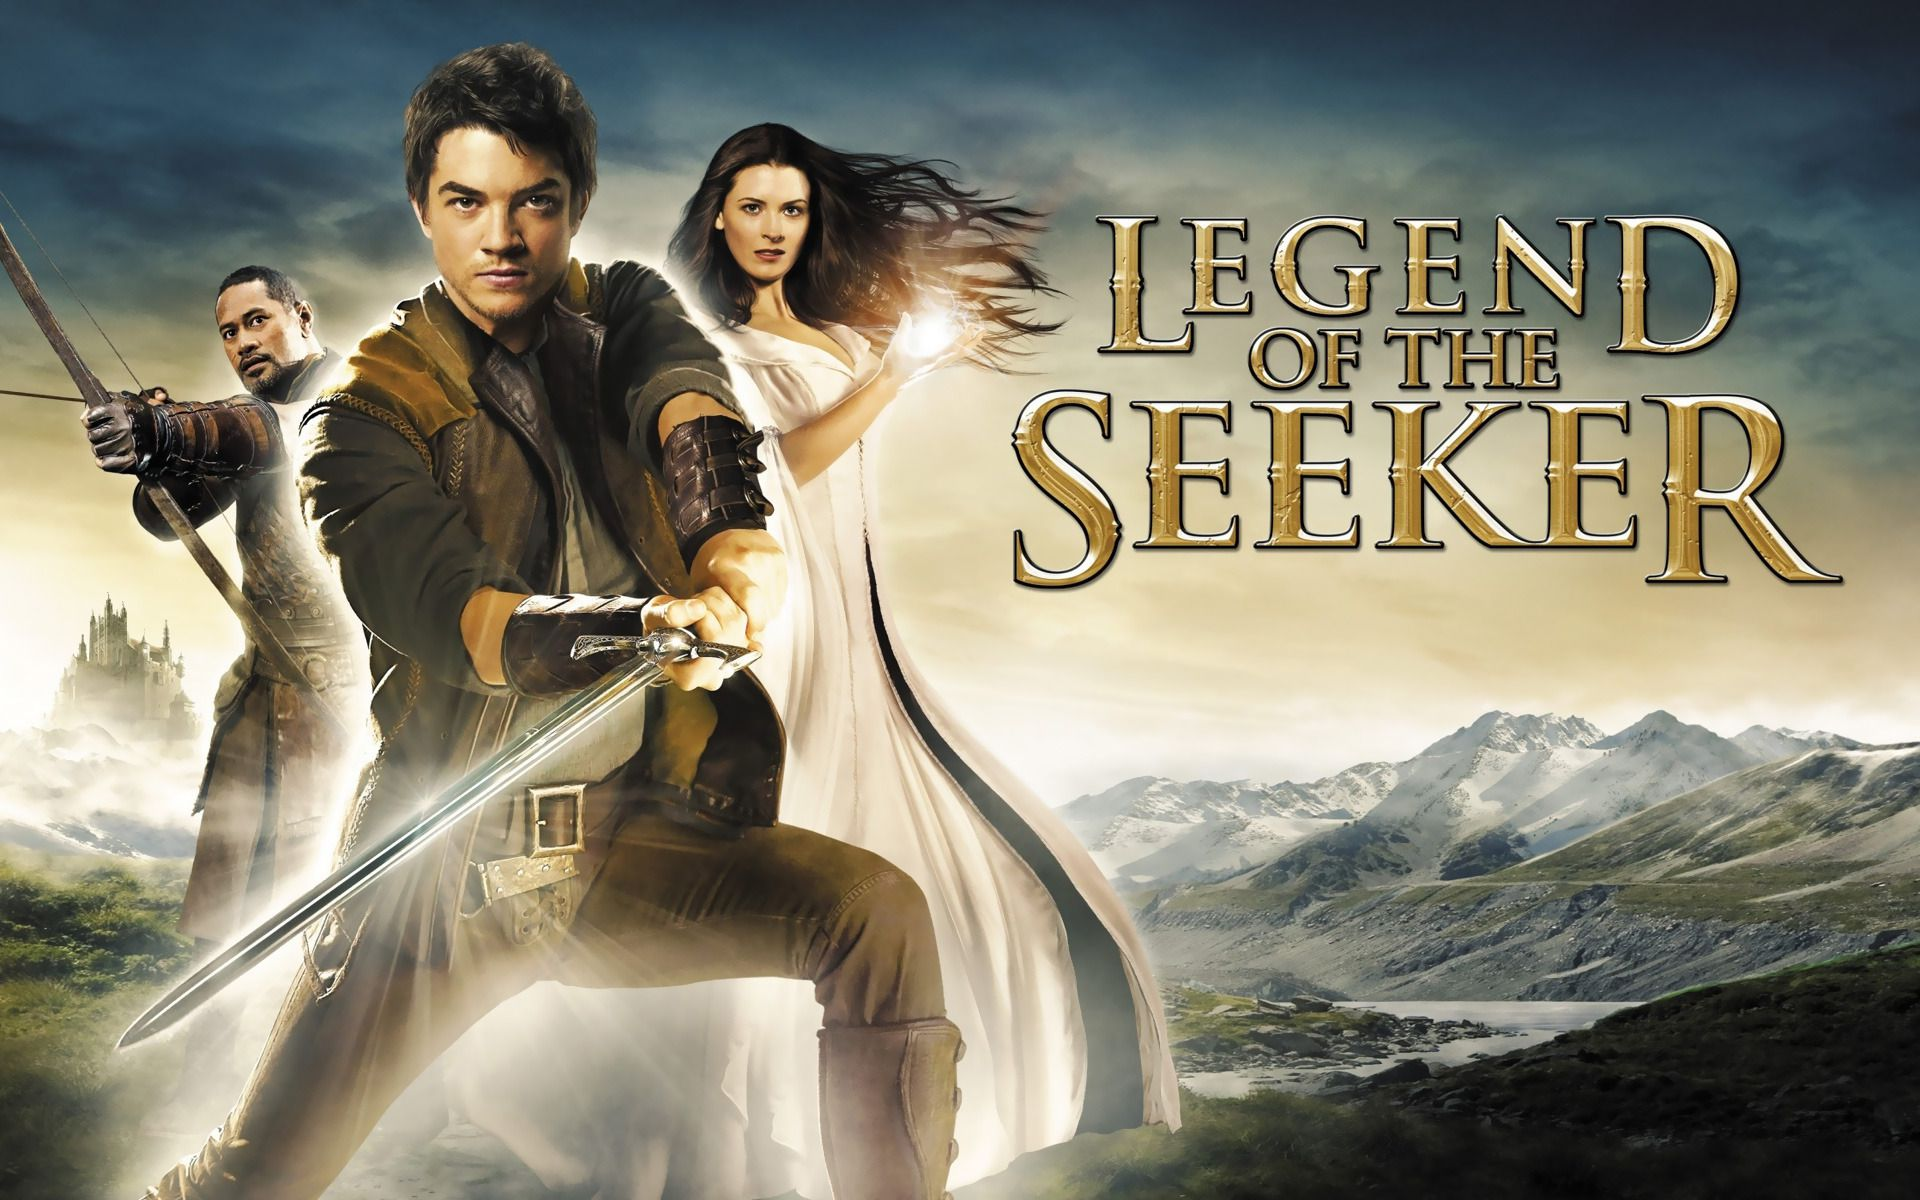 legend of the seeker 2 download